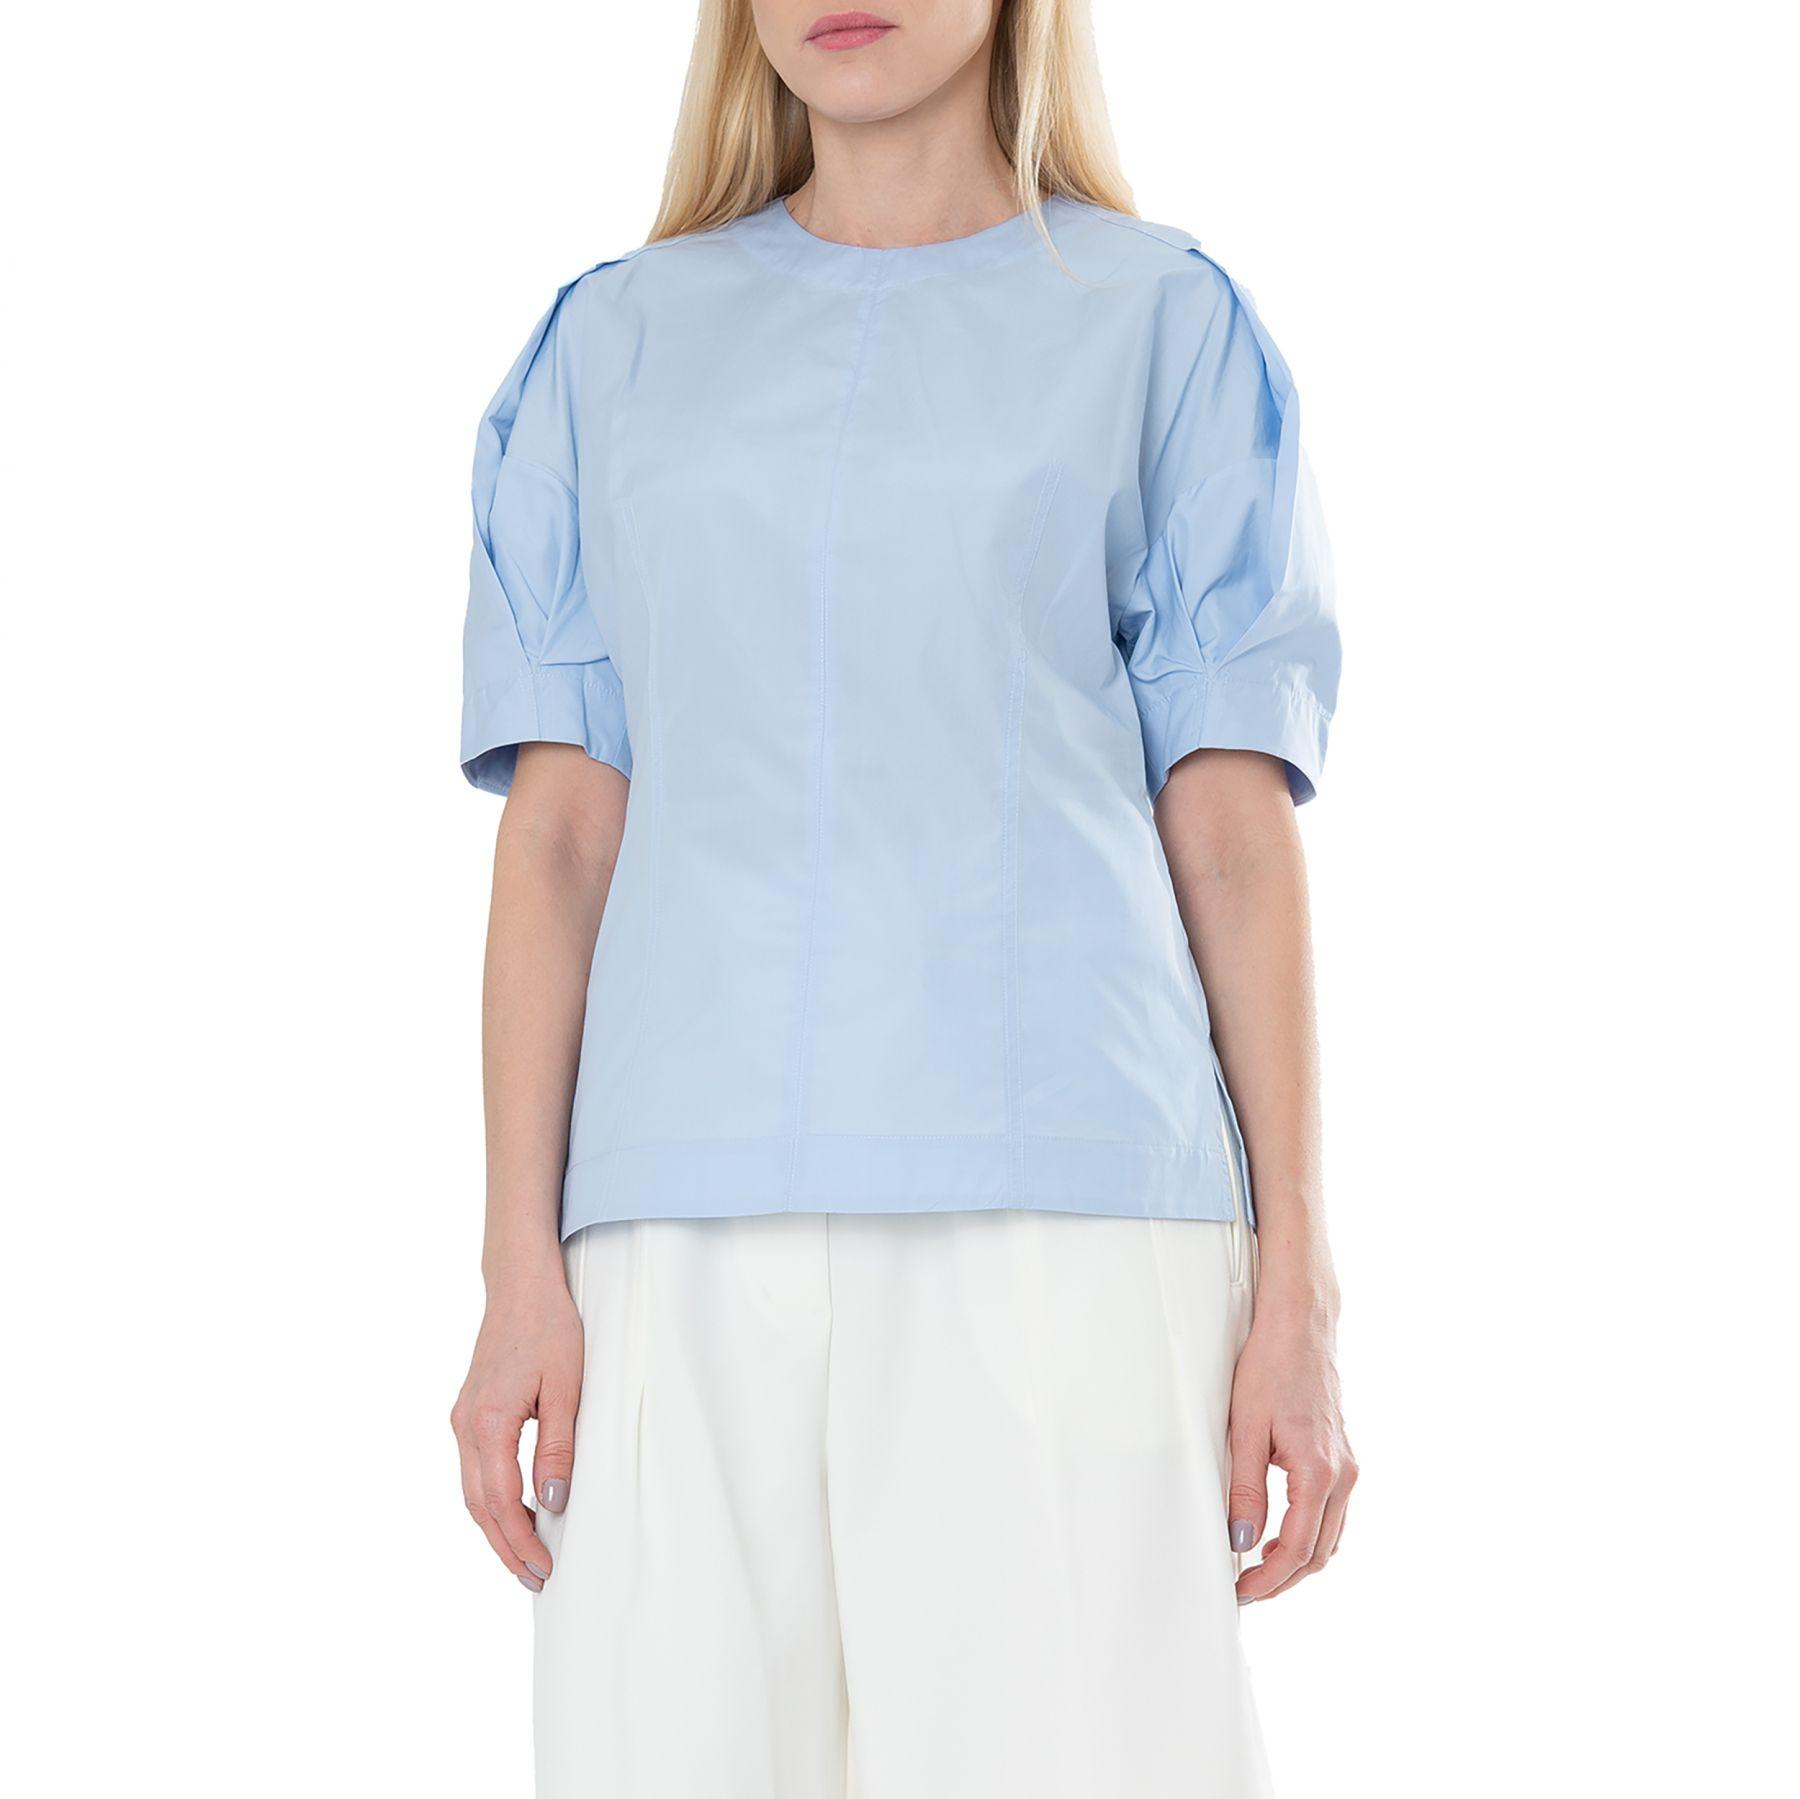 Блуза 3.1 Phillip Lim 3.1 Phillip Lim голубая